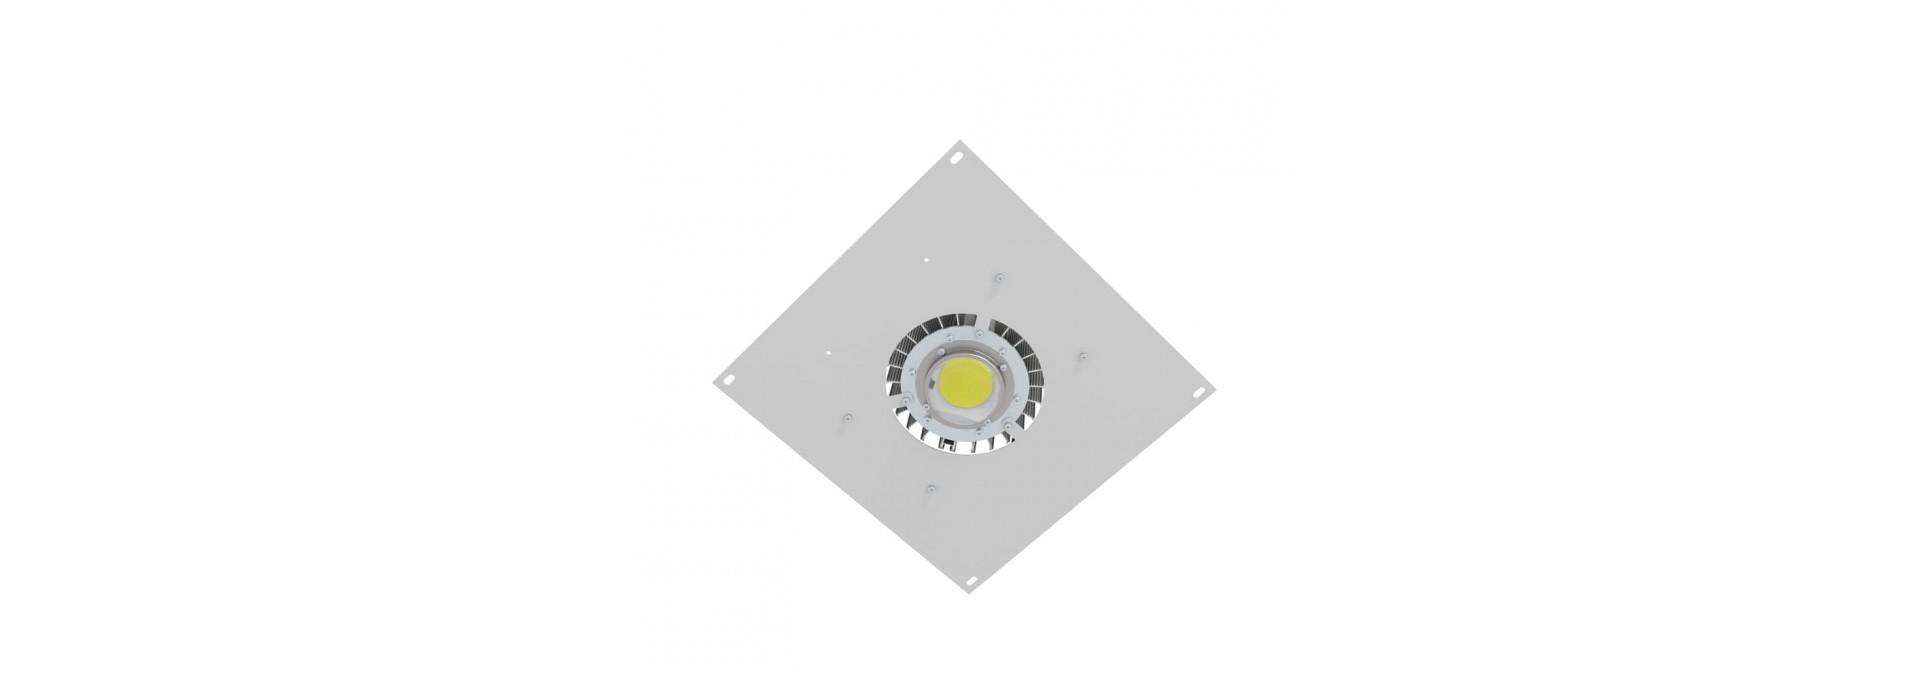 АЗС 100 Эко 4500К 45°